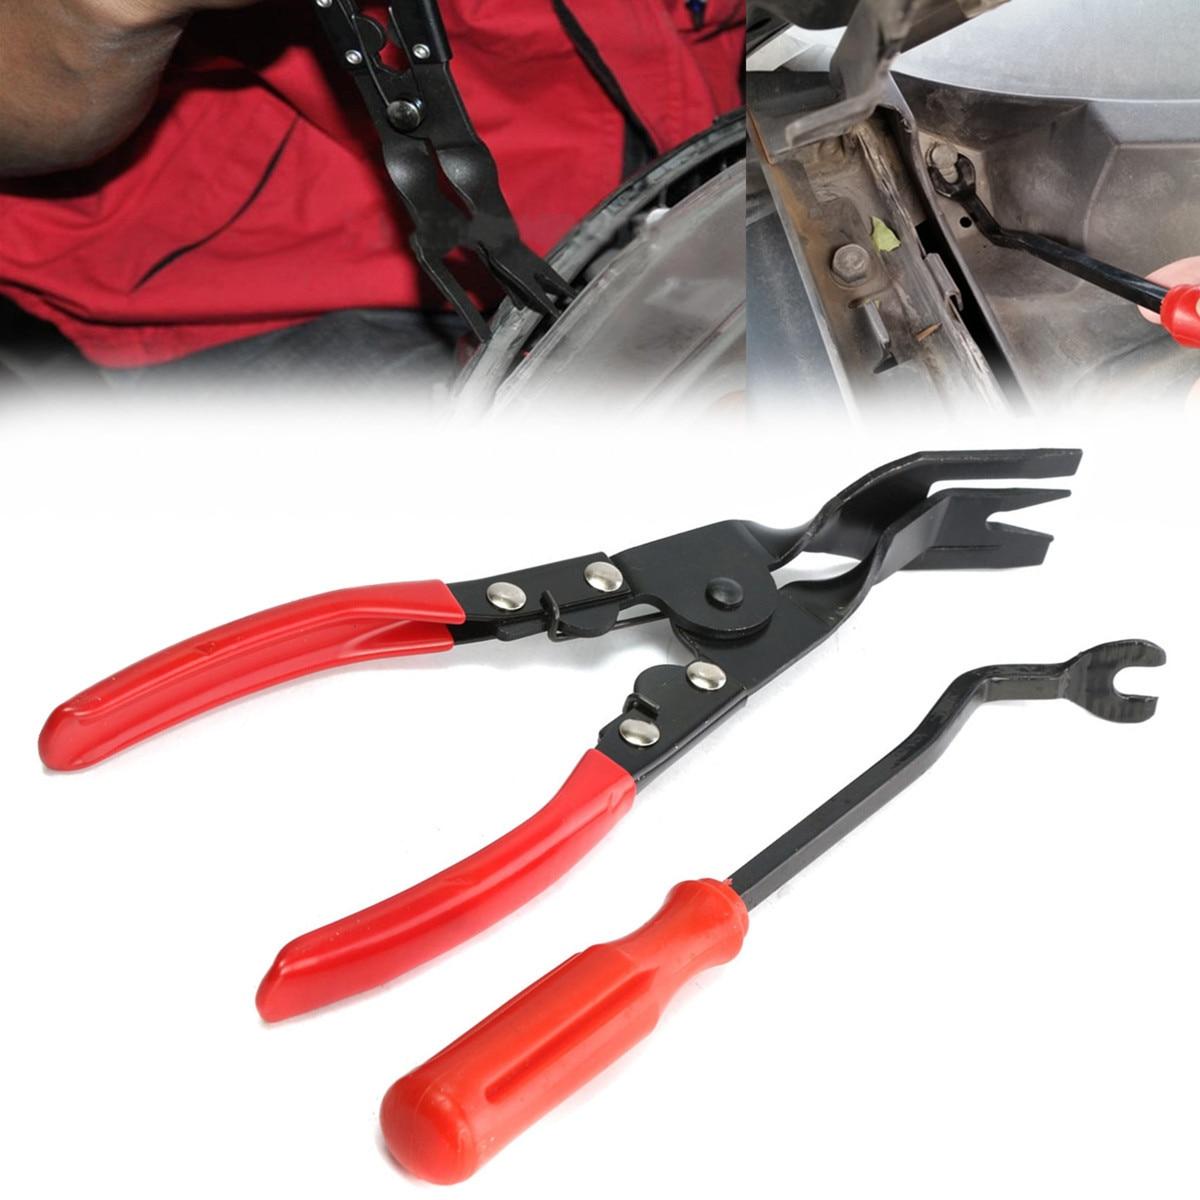 2Pcs Car Clips Car Door Upholstery Remover & Trim Clip Removal Pliers Pry Bar Combo Pry Door Molding Dash Panel Rivet Tool